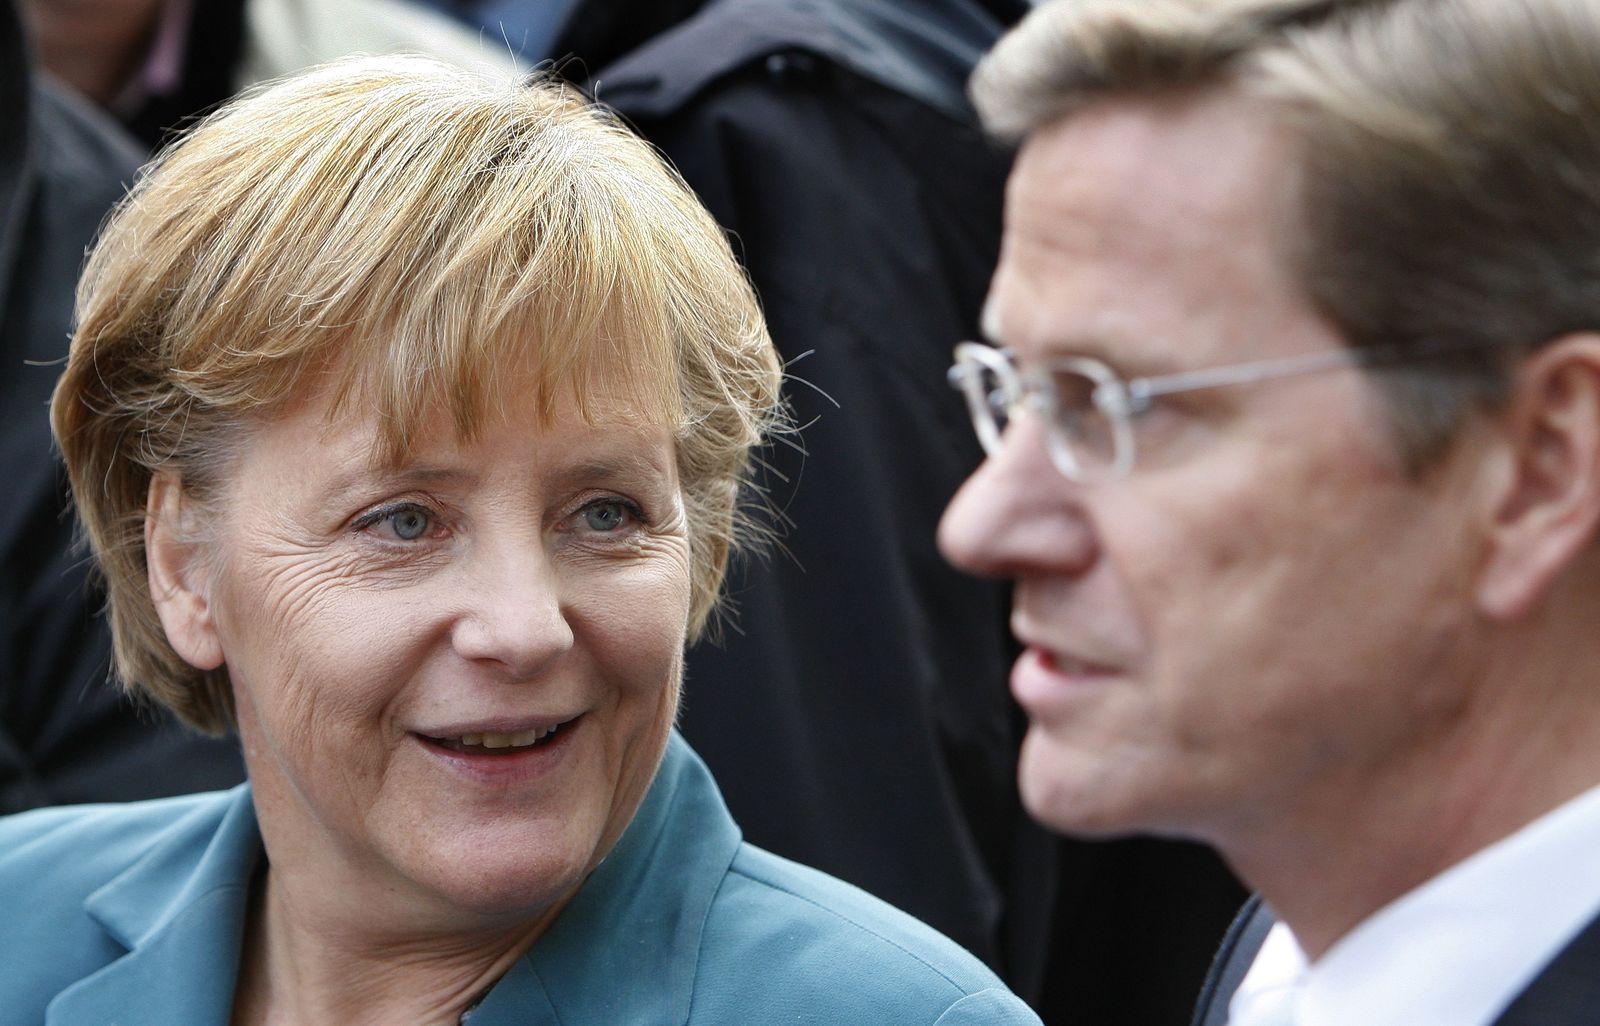 Koalitionsverhandlungen Angela Merkel / Guido Westerwelle